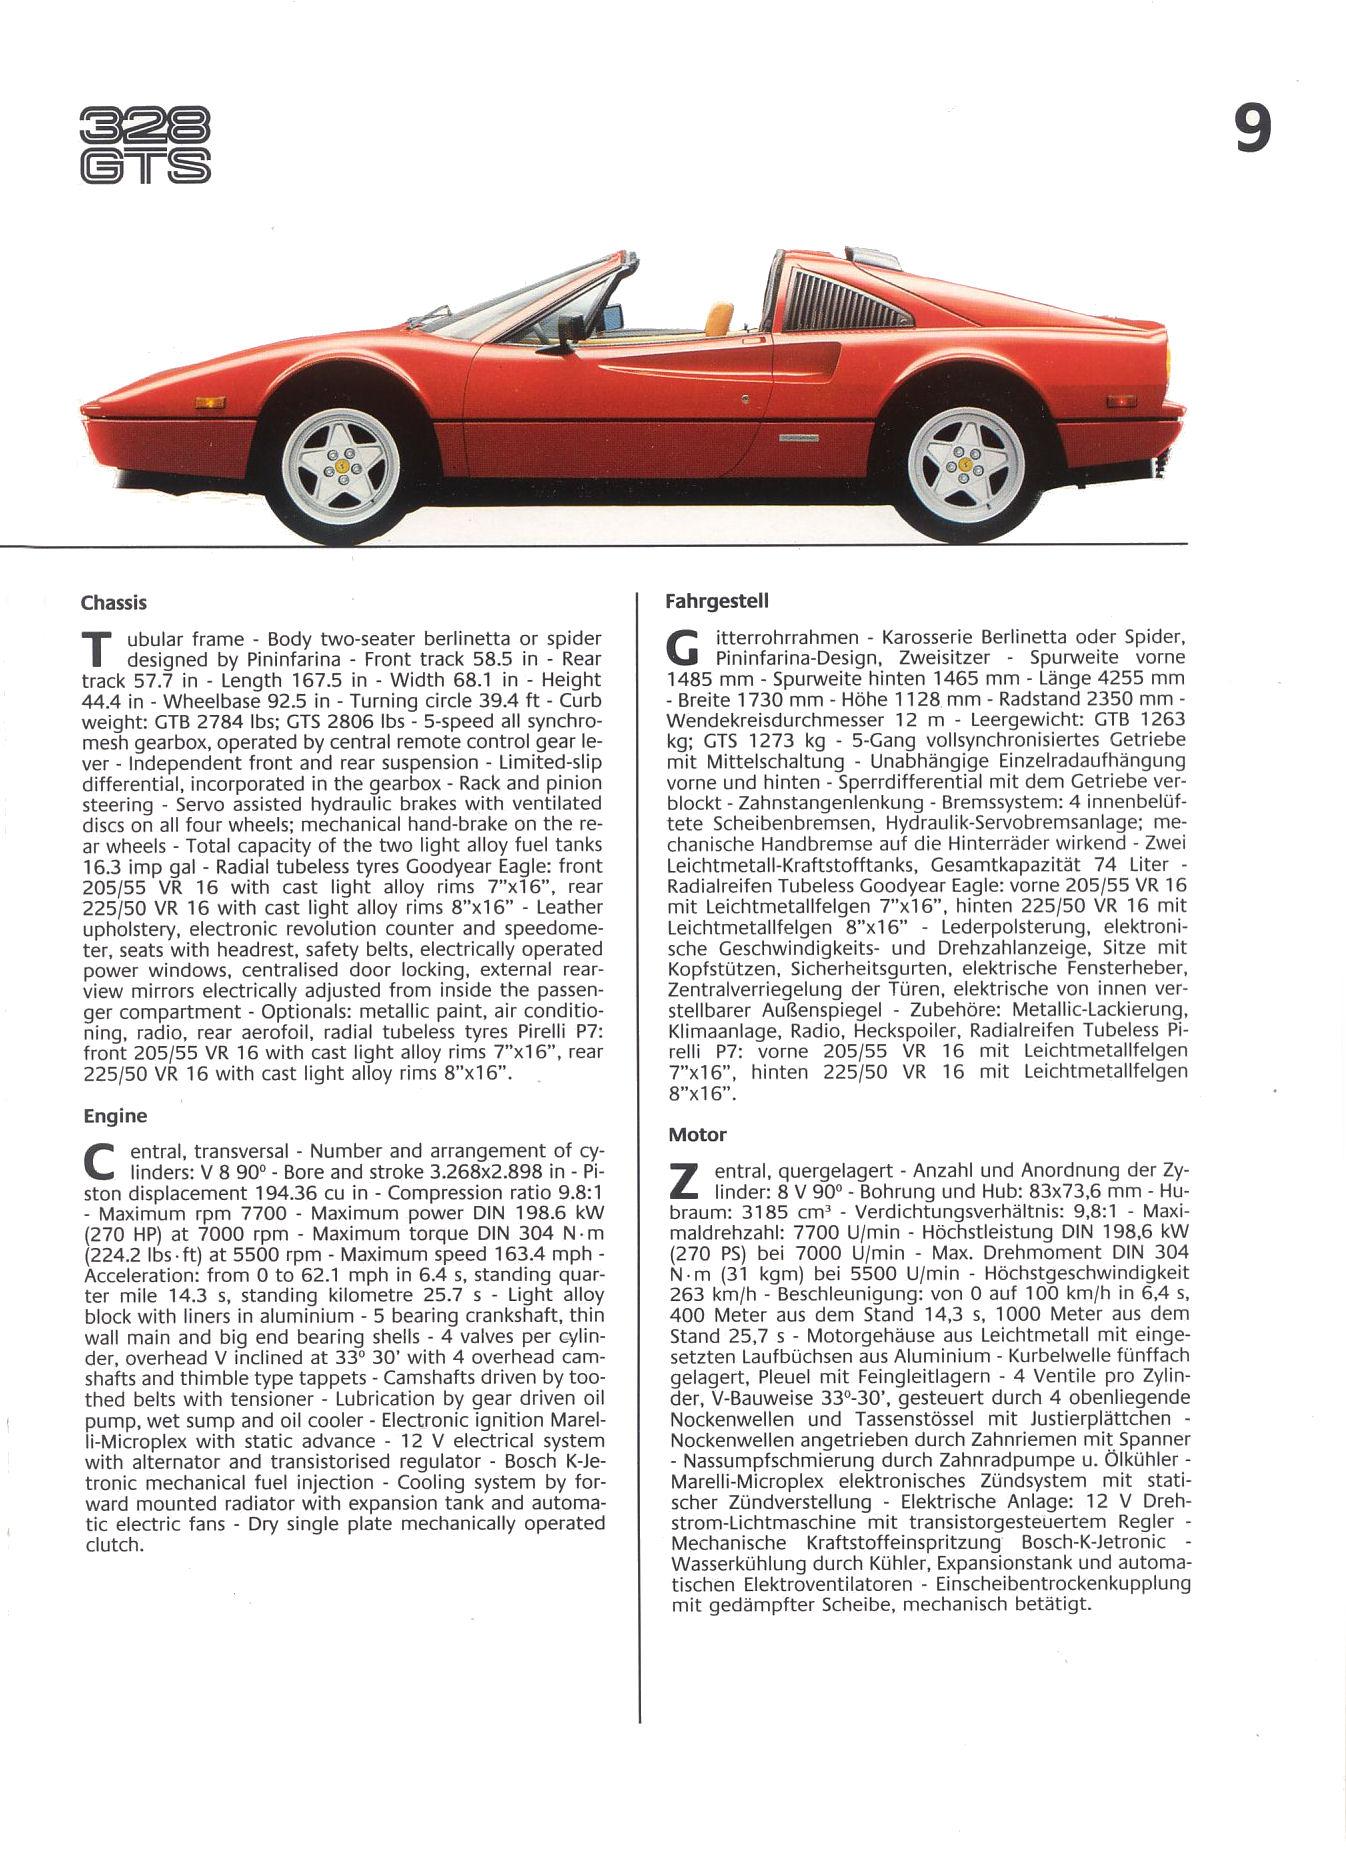 Ferrari 1986 Brochure